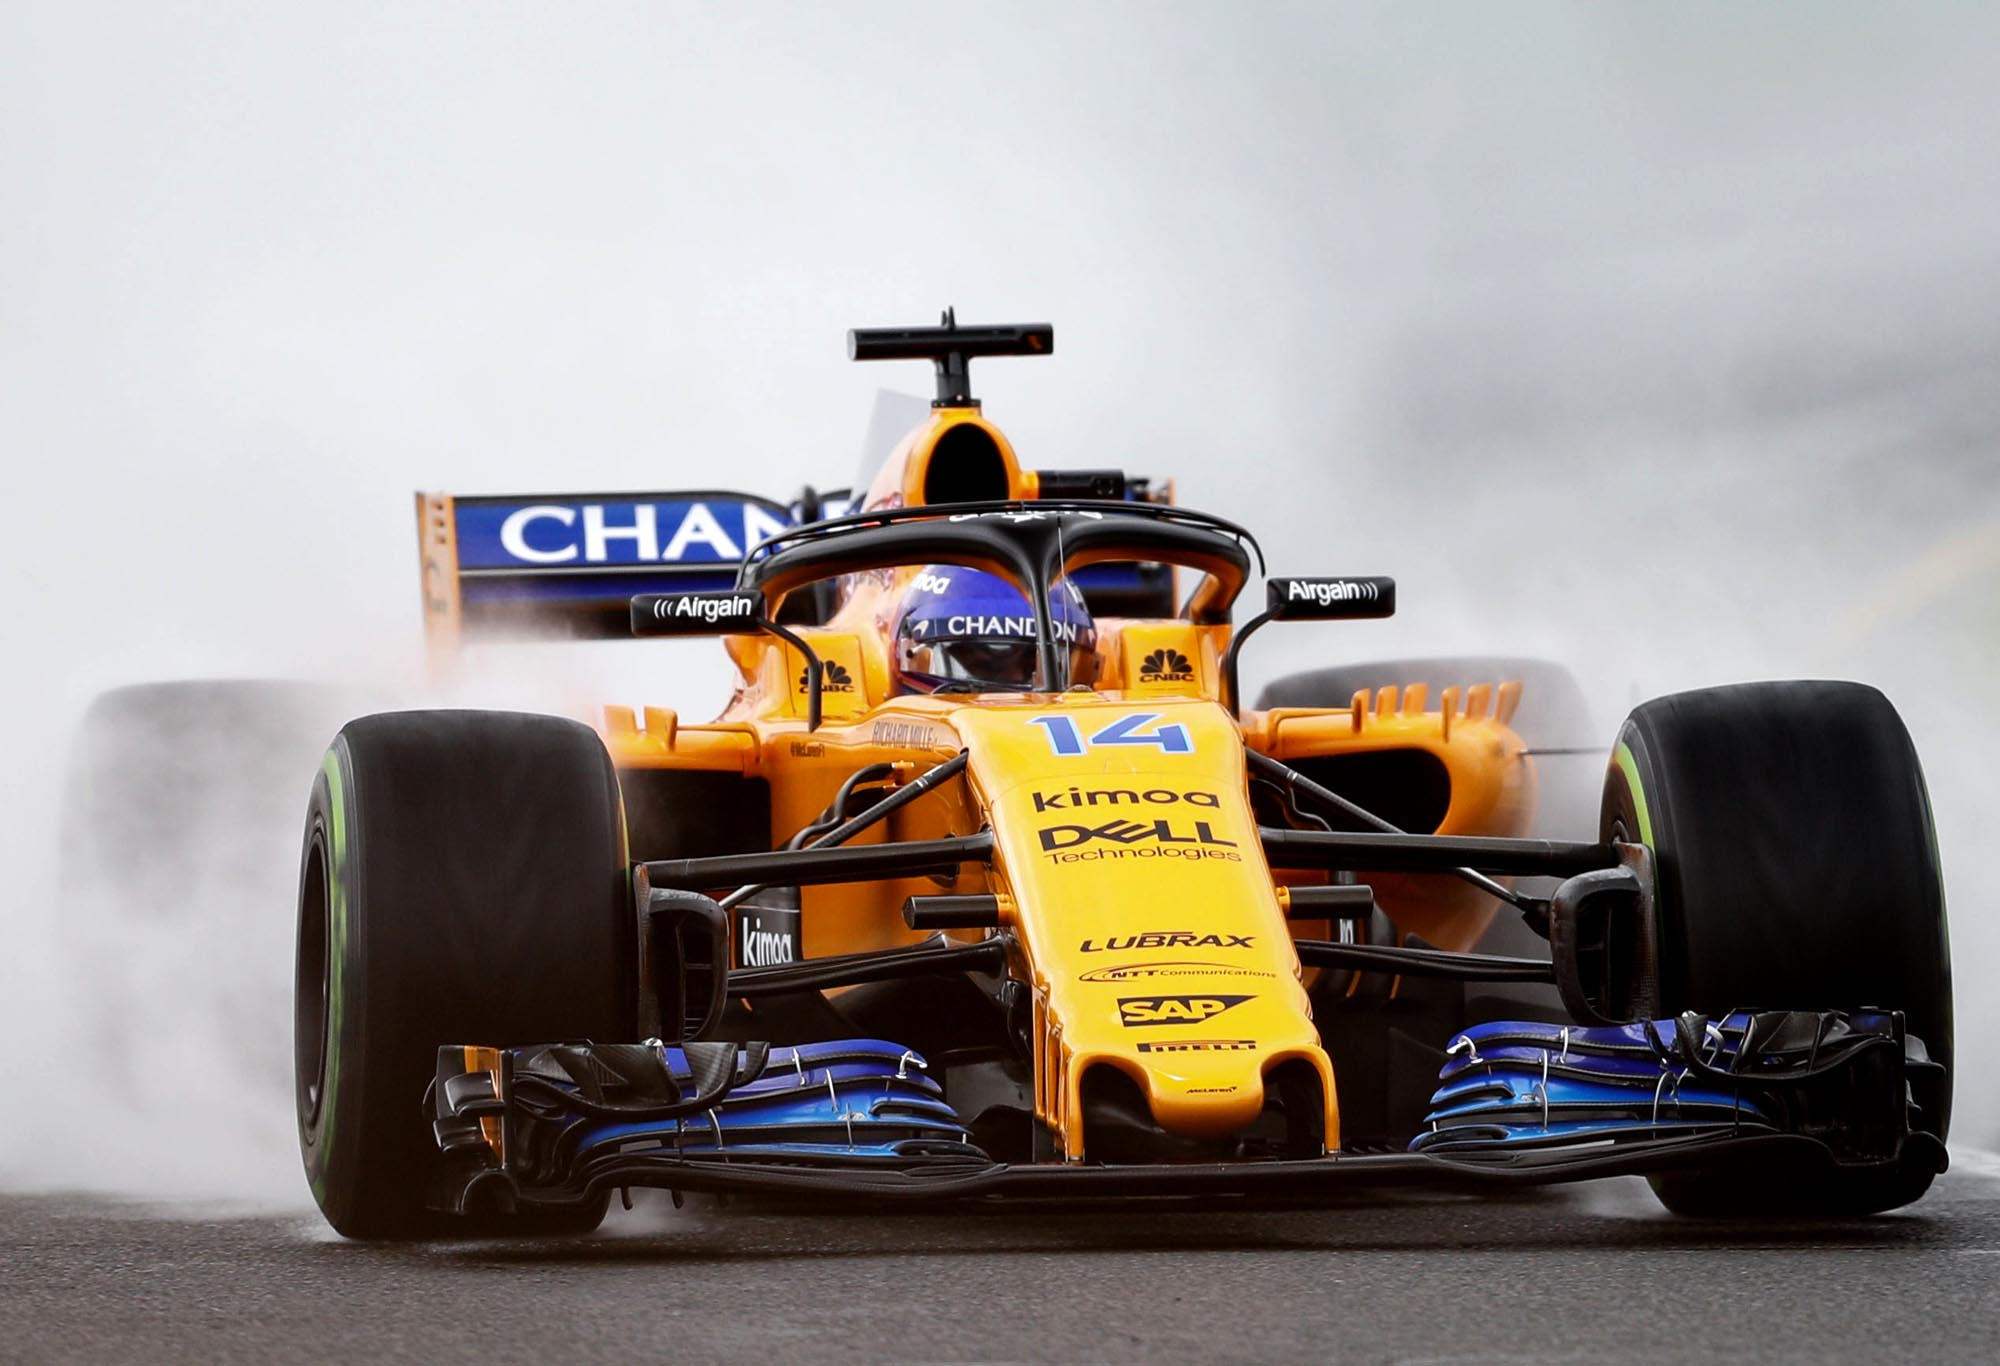 Fernando Alonso drives through a cloud of smoke at the 2018 Australian Grand Prix.